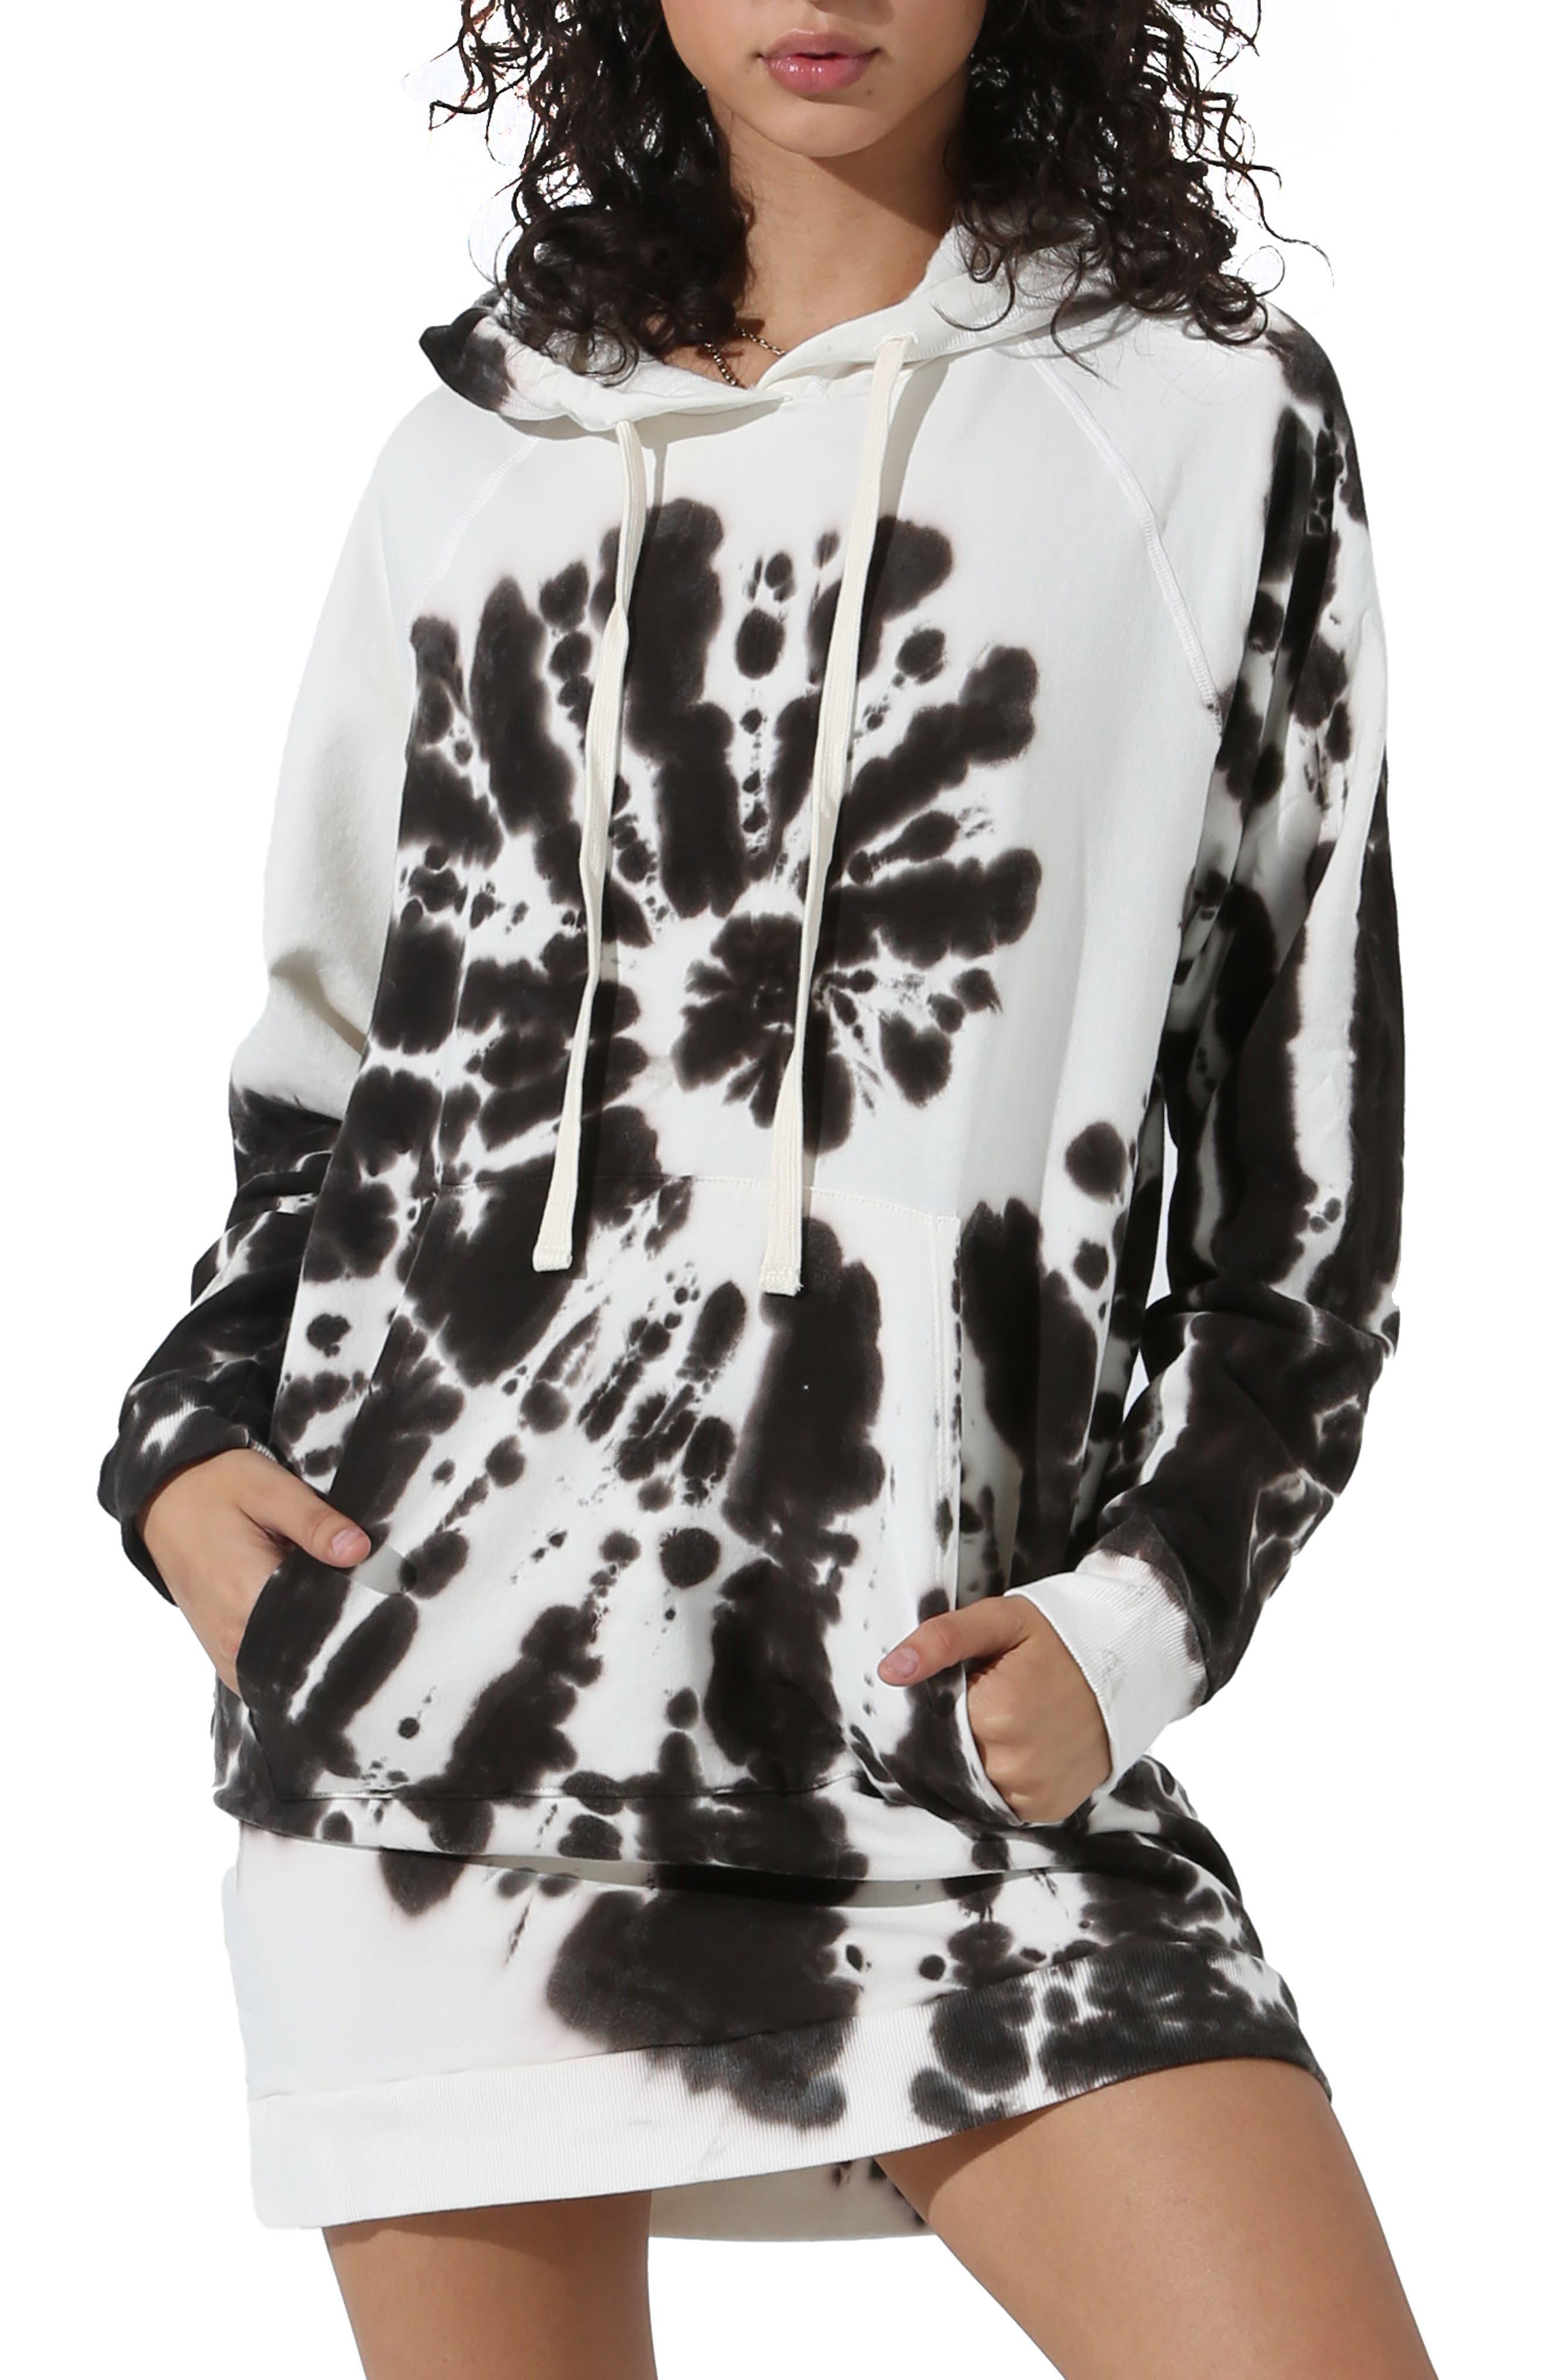 Malibu Hoodie Dress